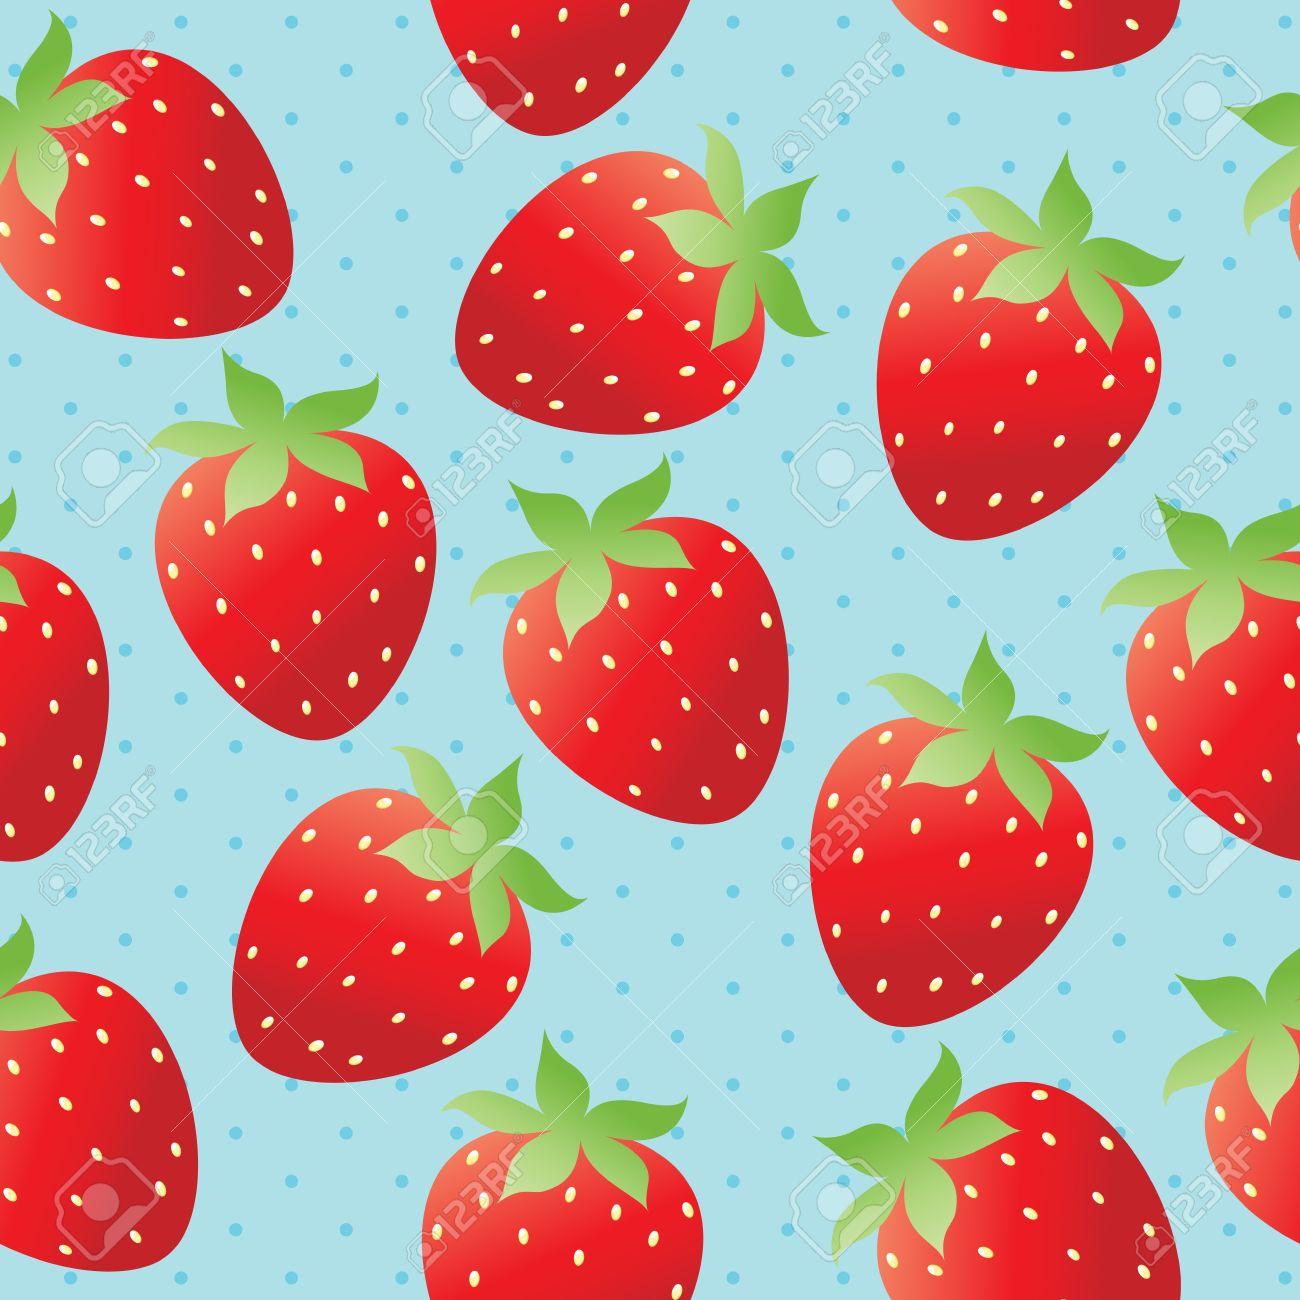 Bright Strawberry Wallpaper Stock Vector